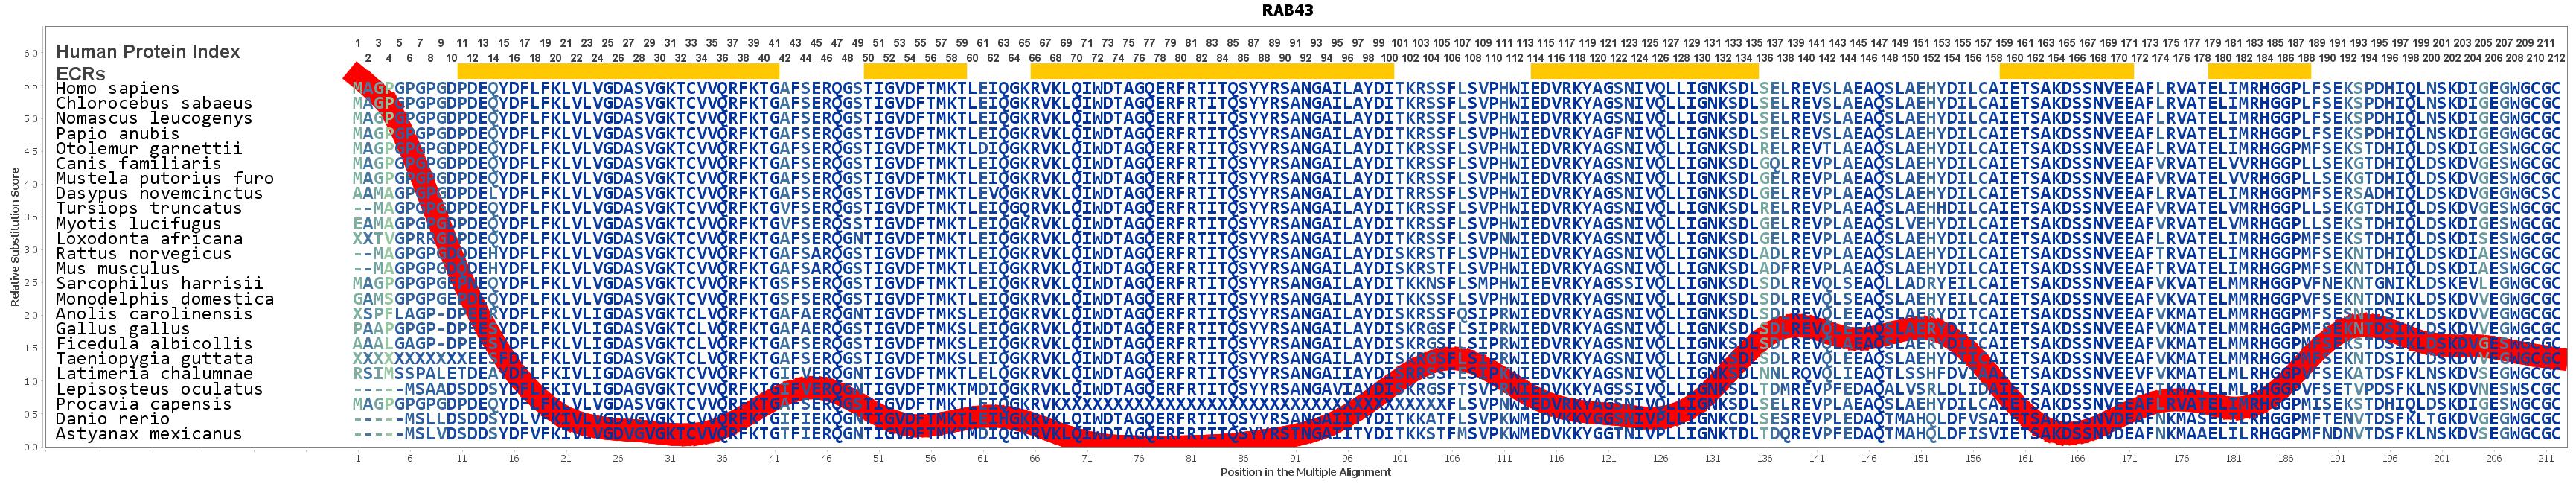 RAB43 Gene - GeneCards | RAB43 Protein | RAB43 Antibody